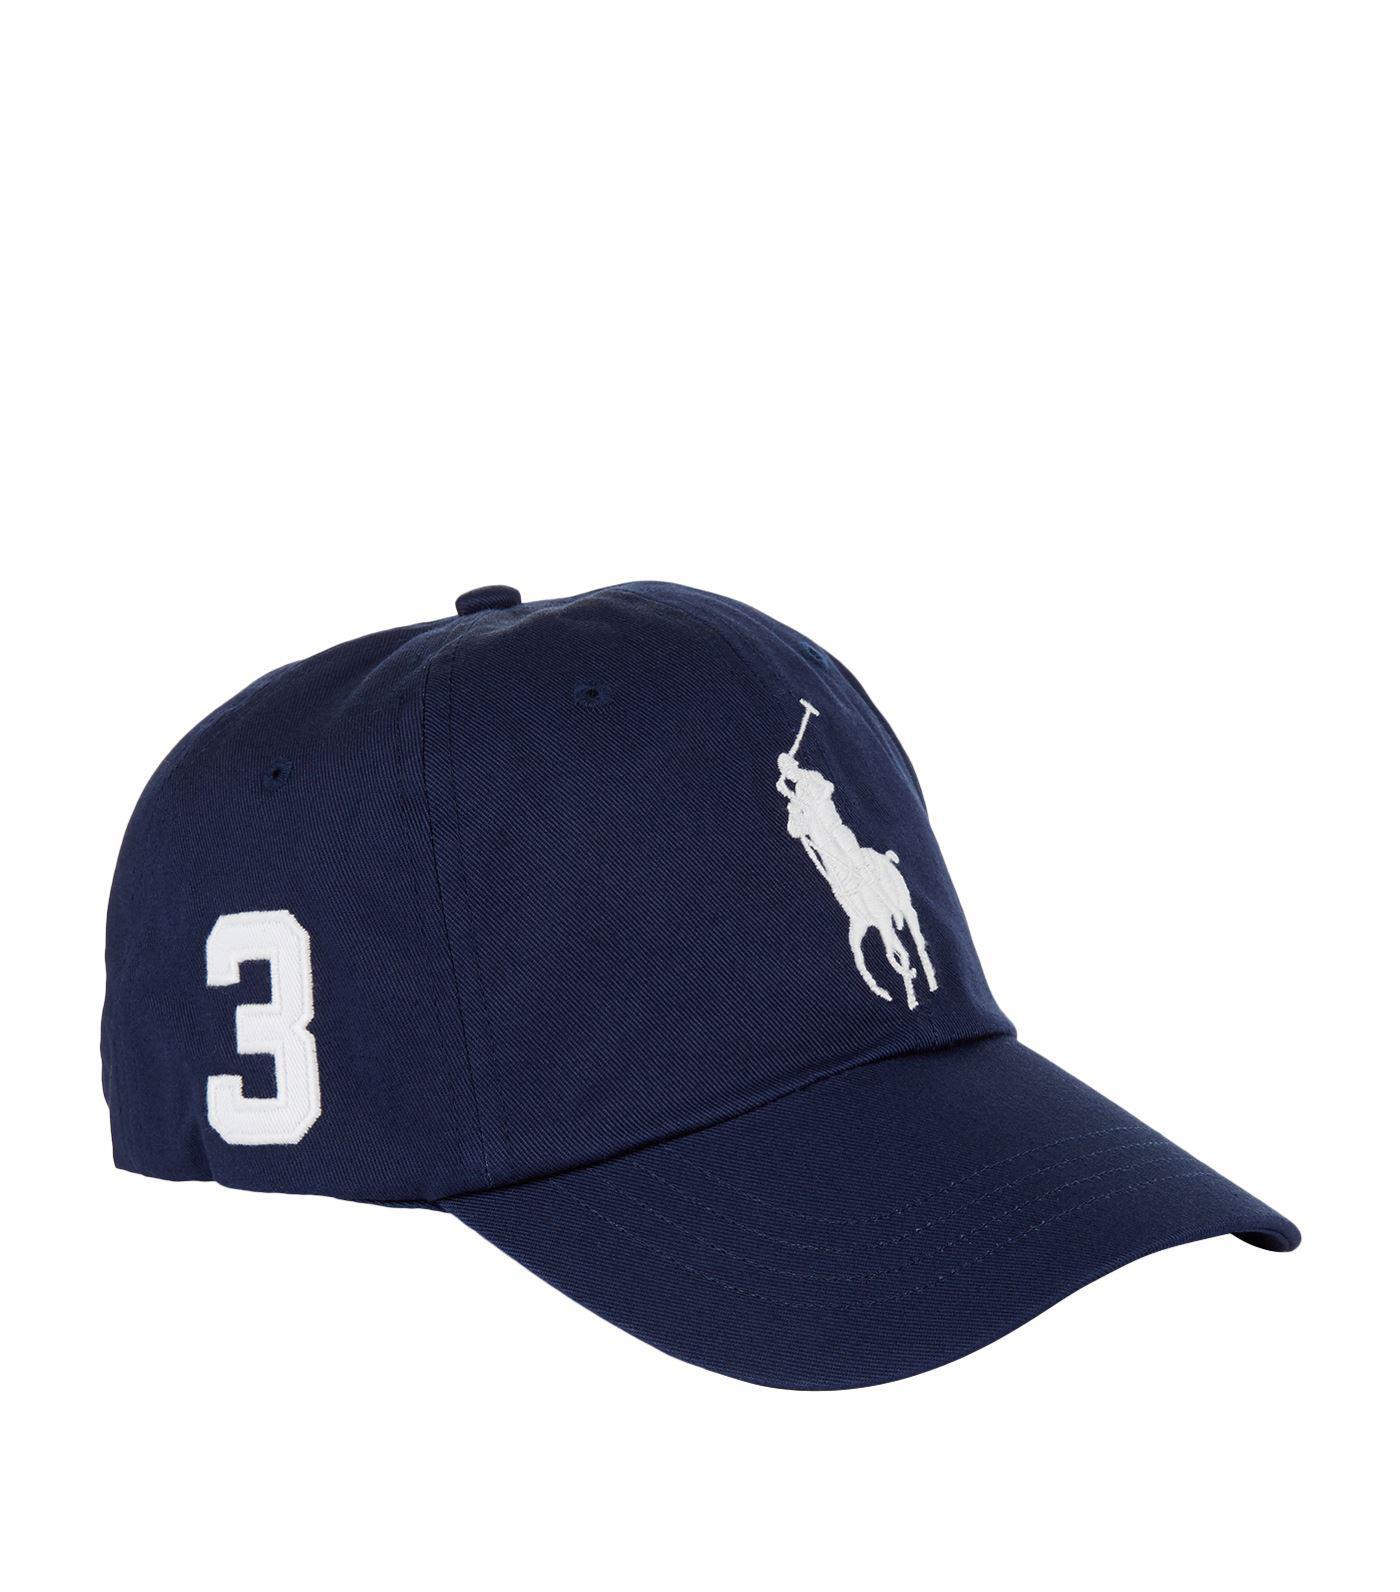 Lyst - Polo Ralph Lauren Big Pony Baseball Cap in Blue for Men fb888b1d304